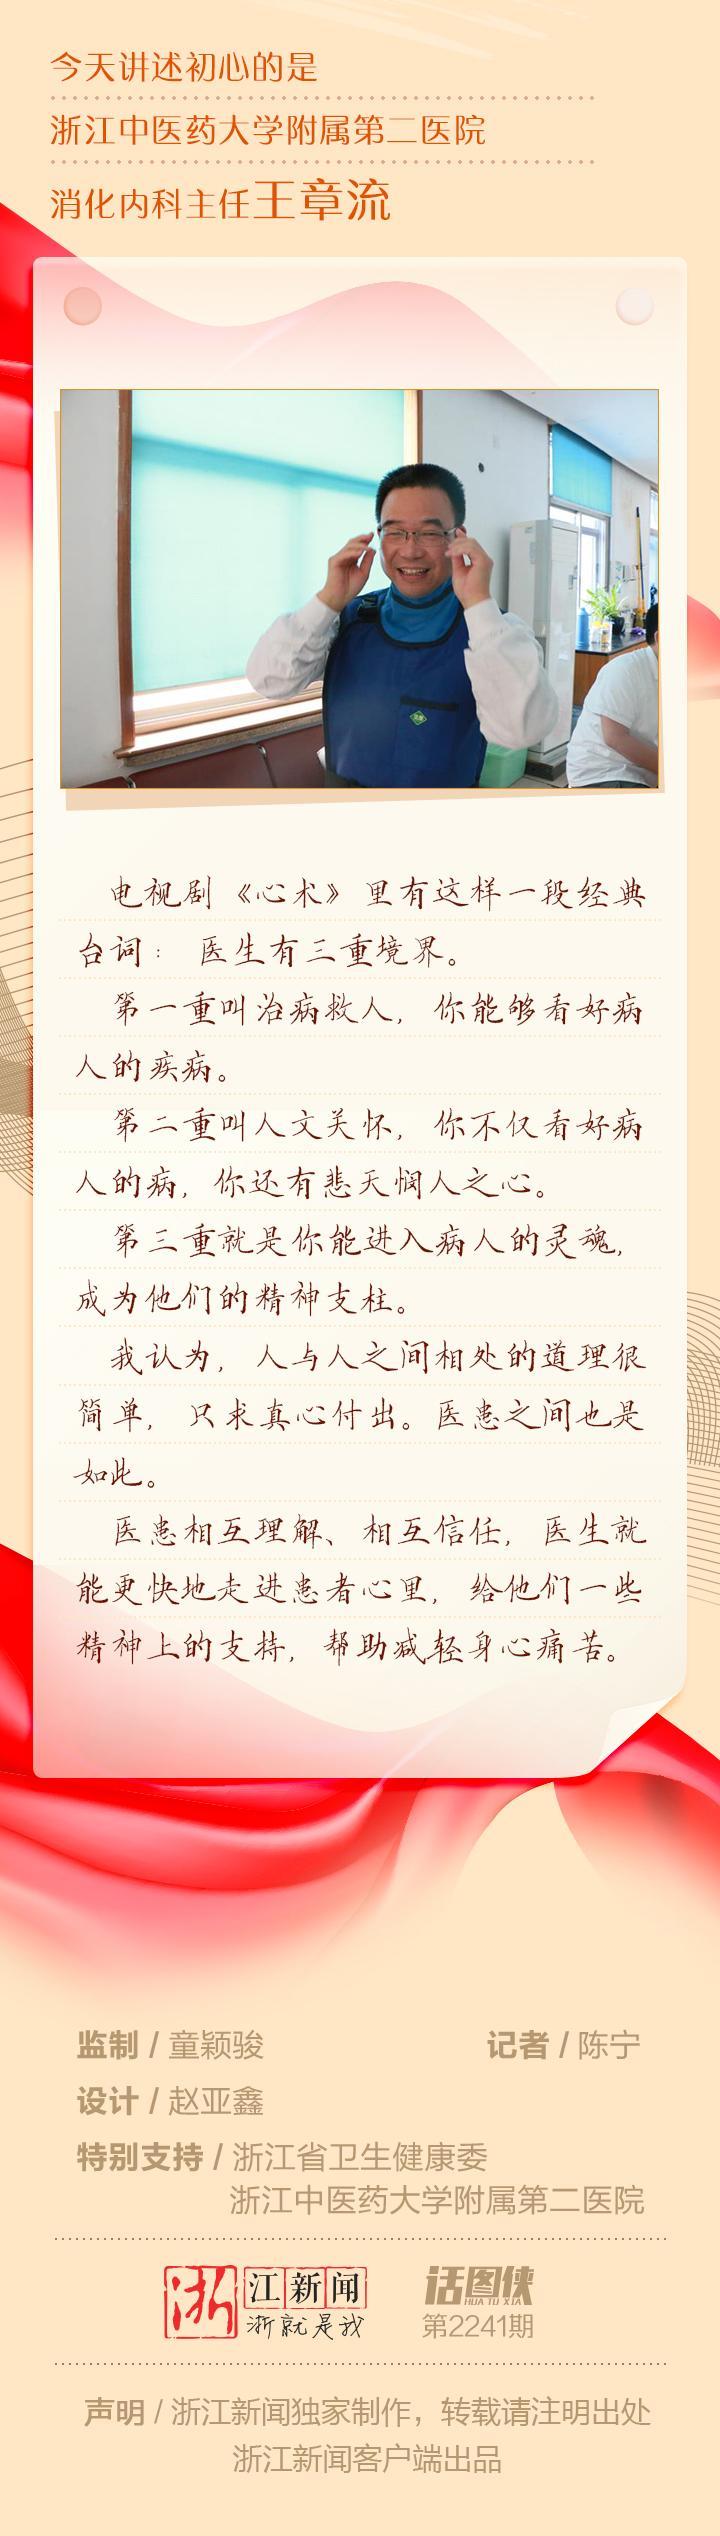 WeChat 圖片_20190822193718.jpg